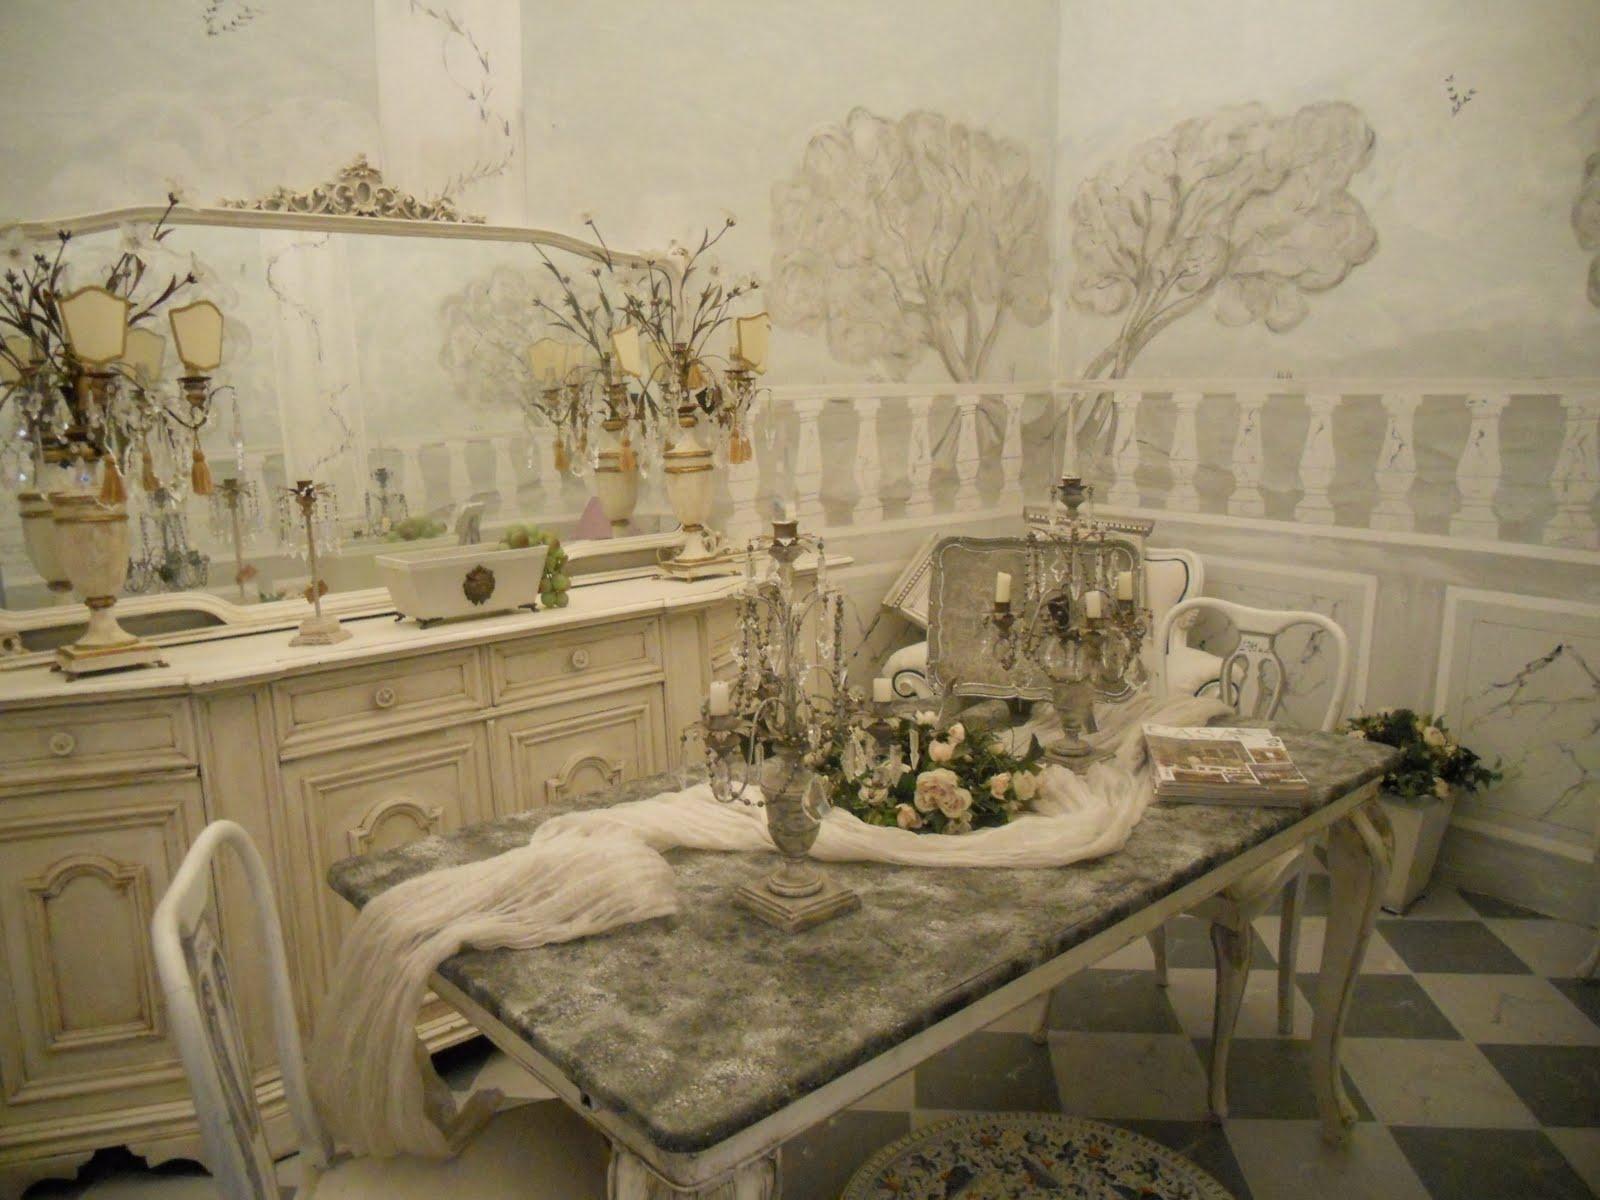 Sala Da Pranzo Shabby Chic : Marzia sofia salvestrini atelier gustavien atelier d arte shabby